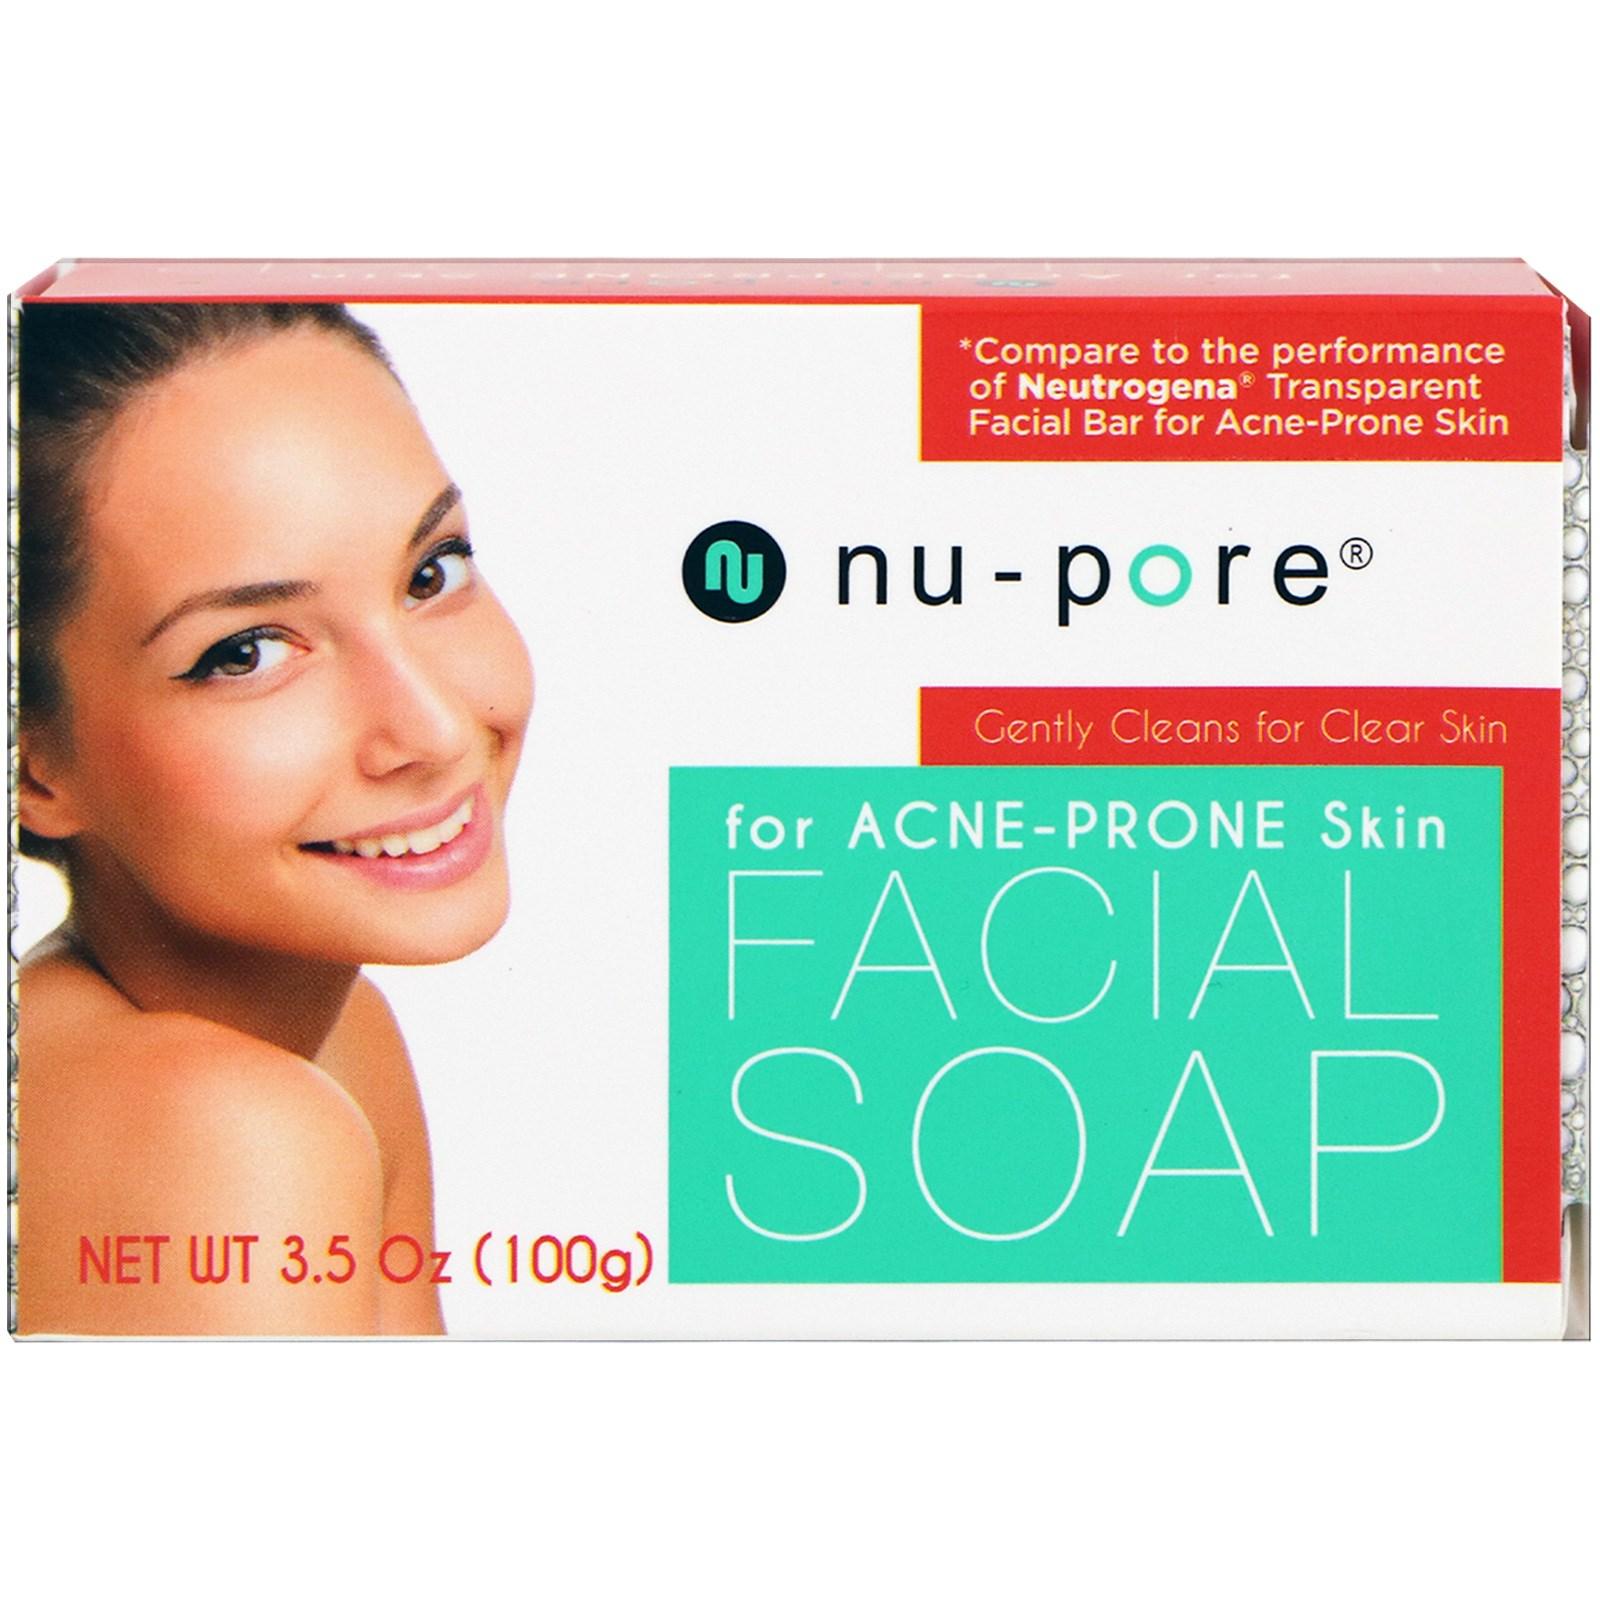 Facial acne prone skin